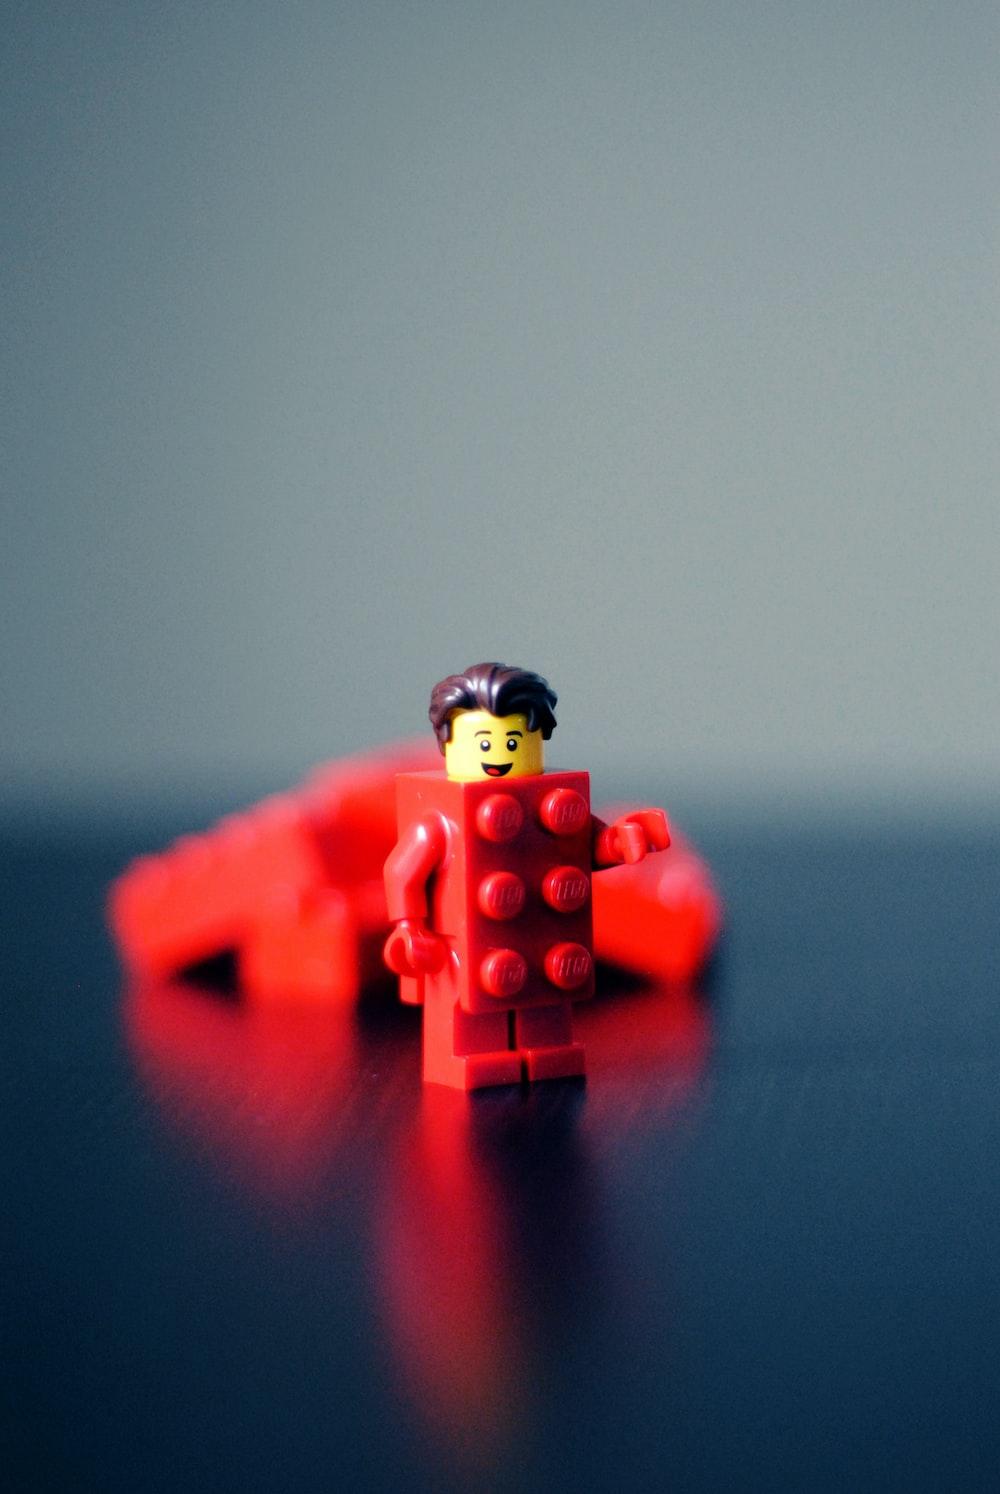 red Lego minifigure